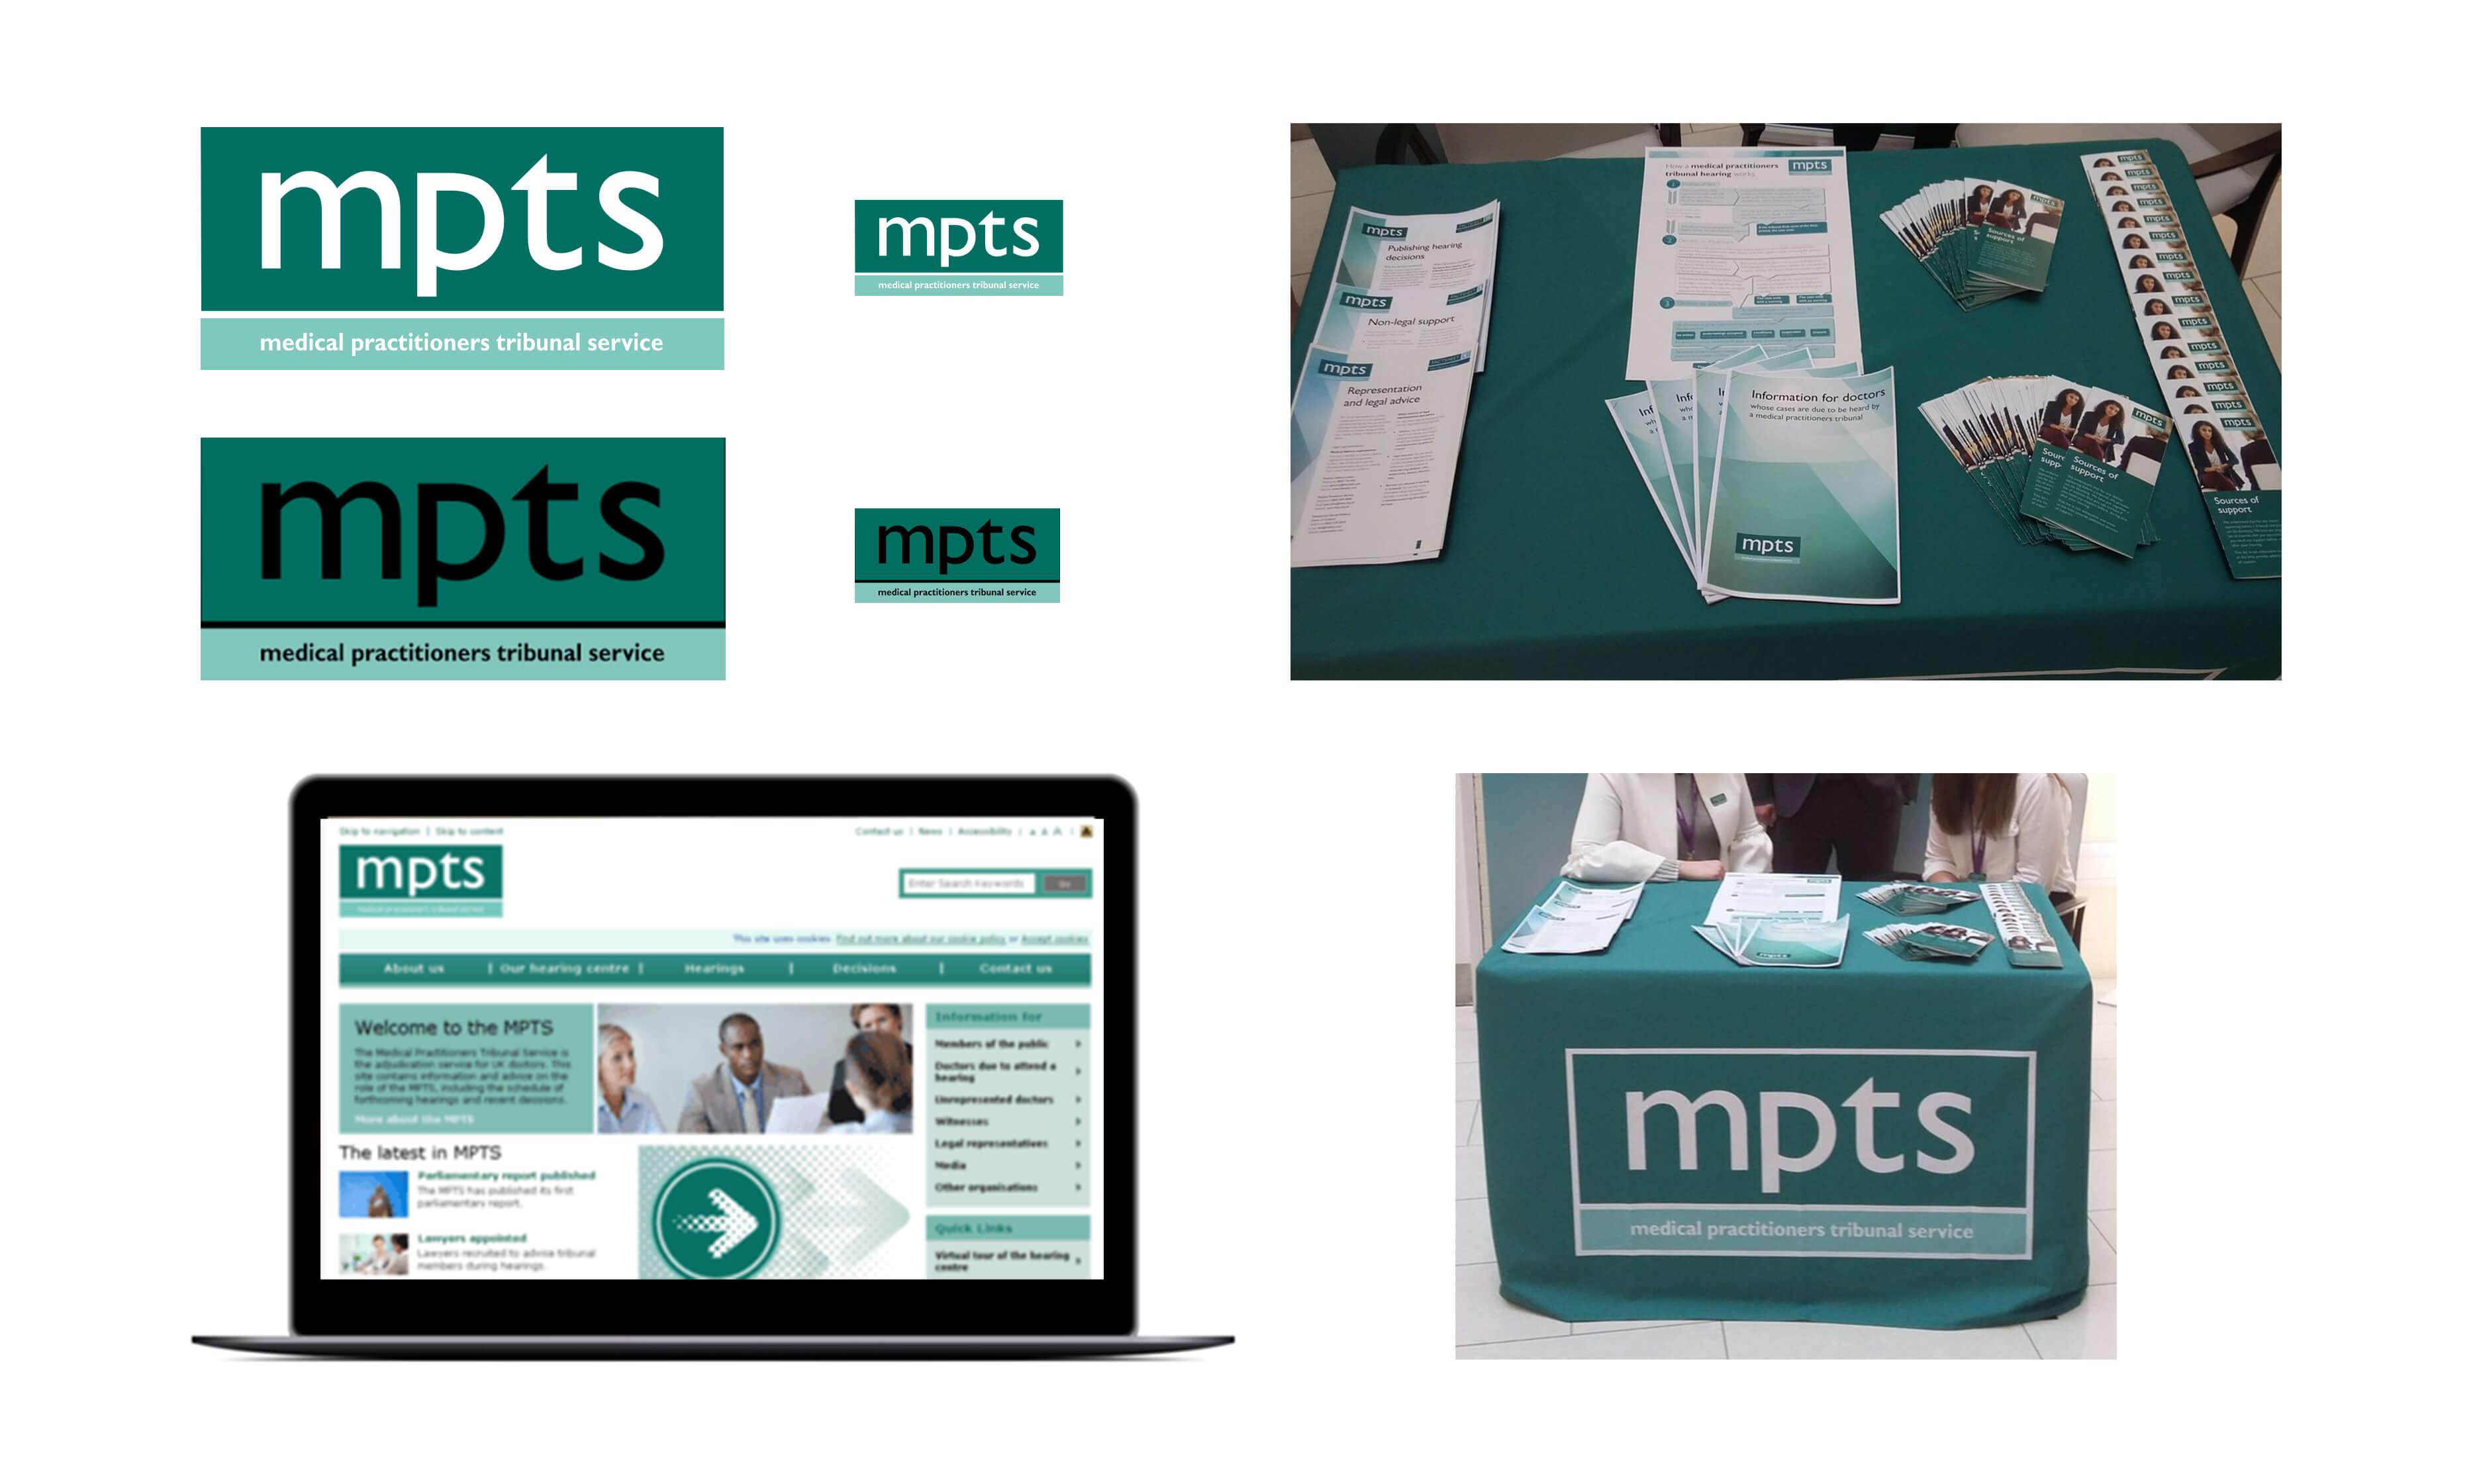 MPTS old identity